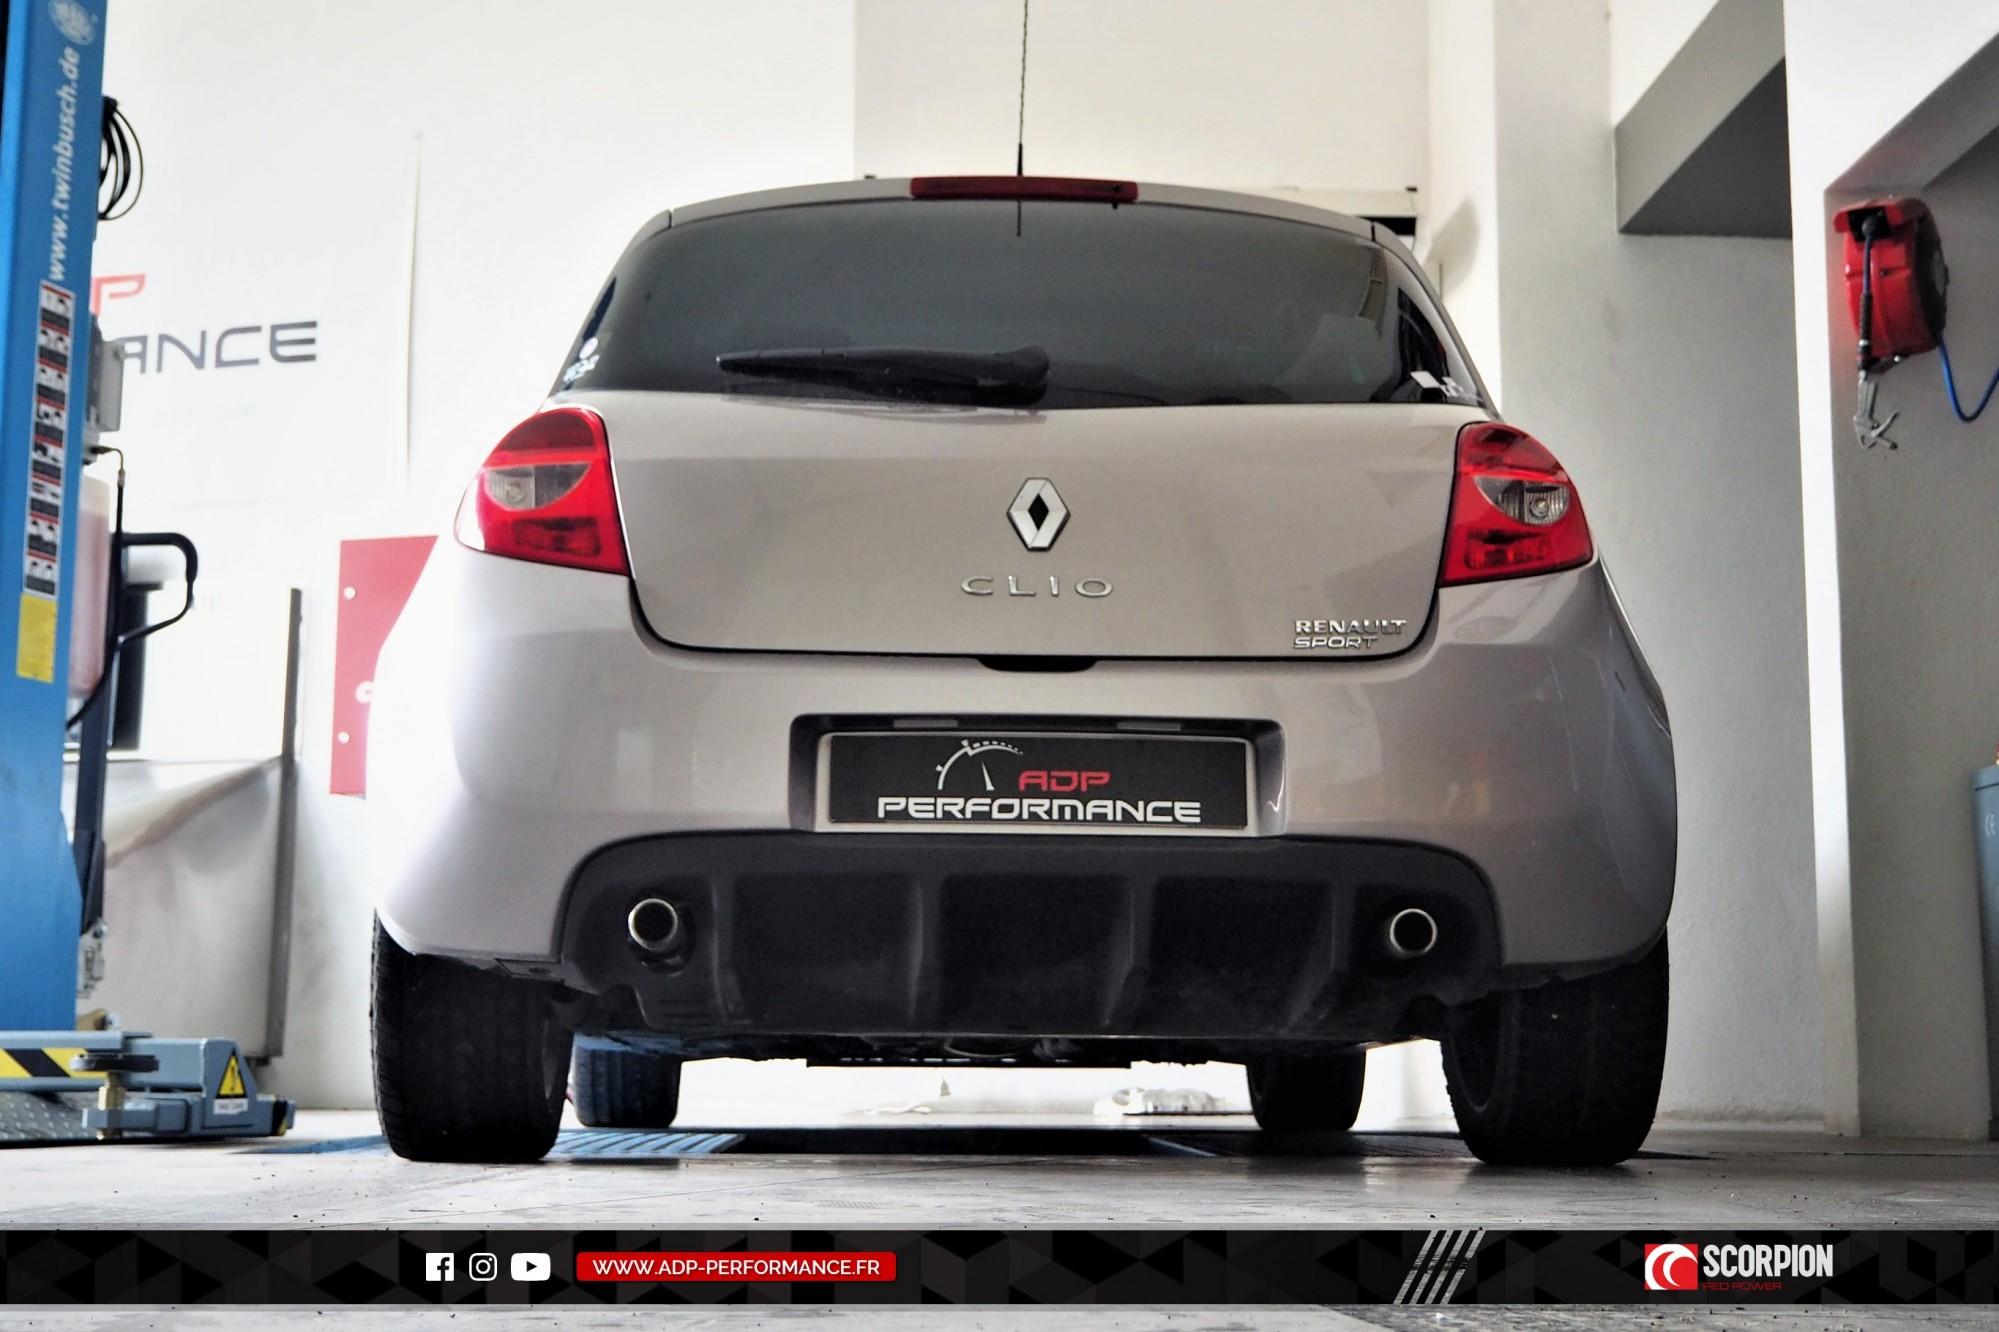 Catback Scorpion Aix en Provence - Renault Clio 3 RS - ADP Performance